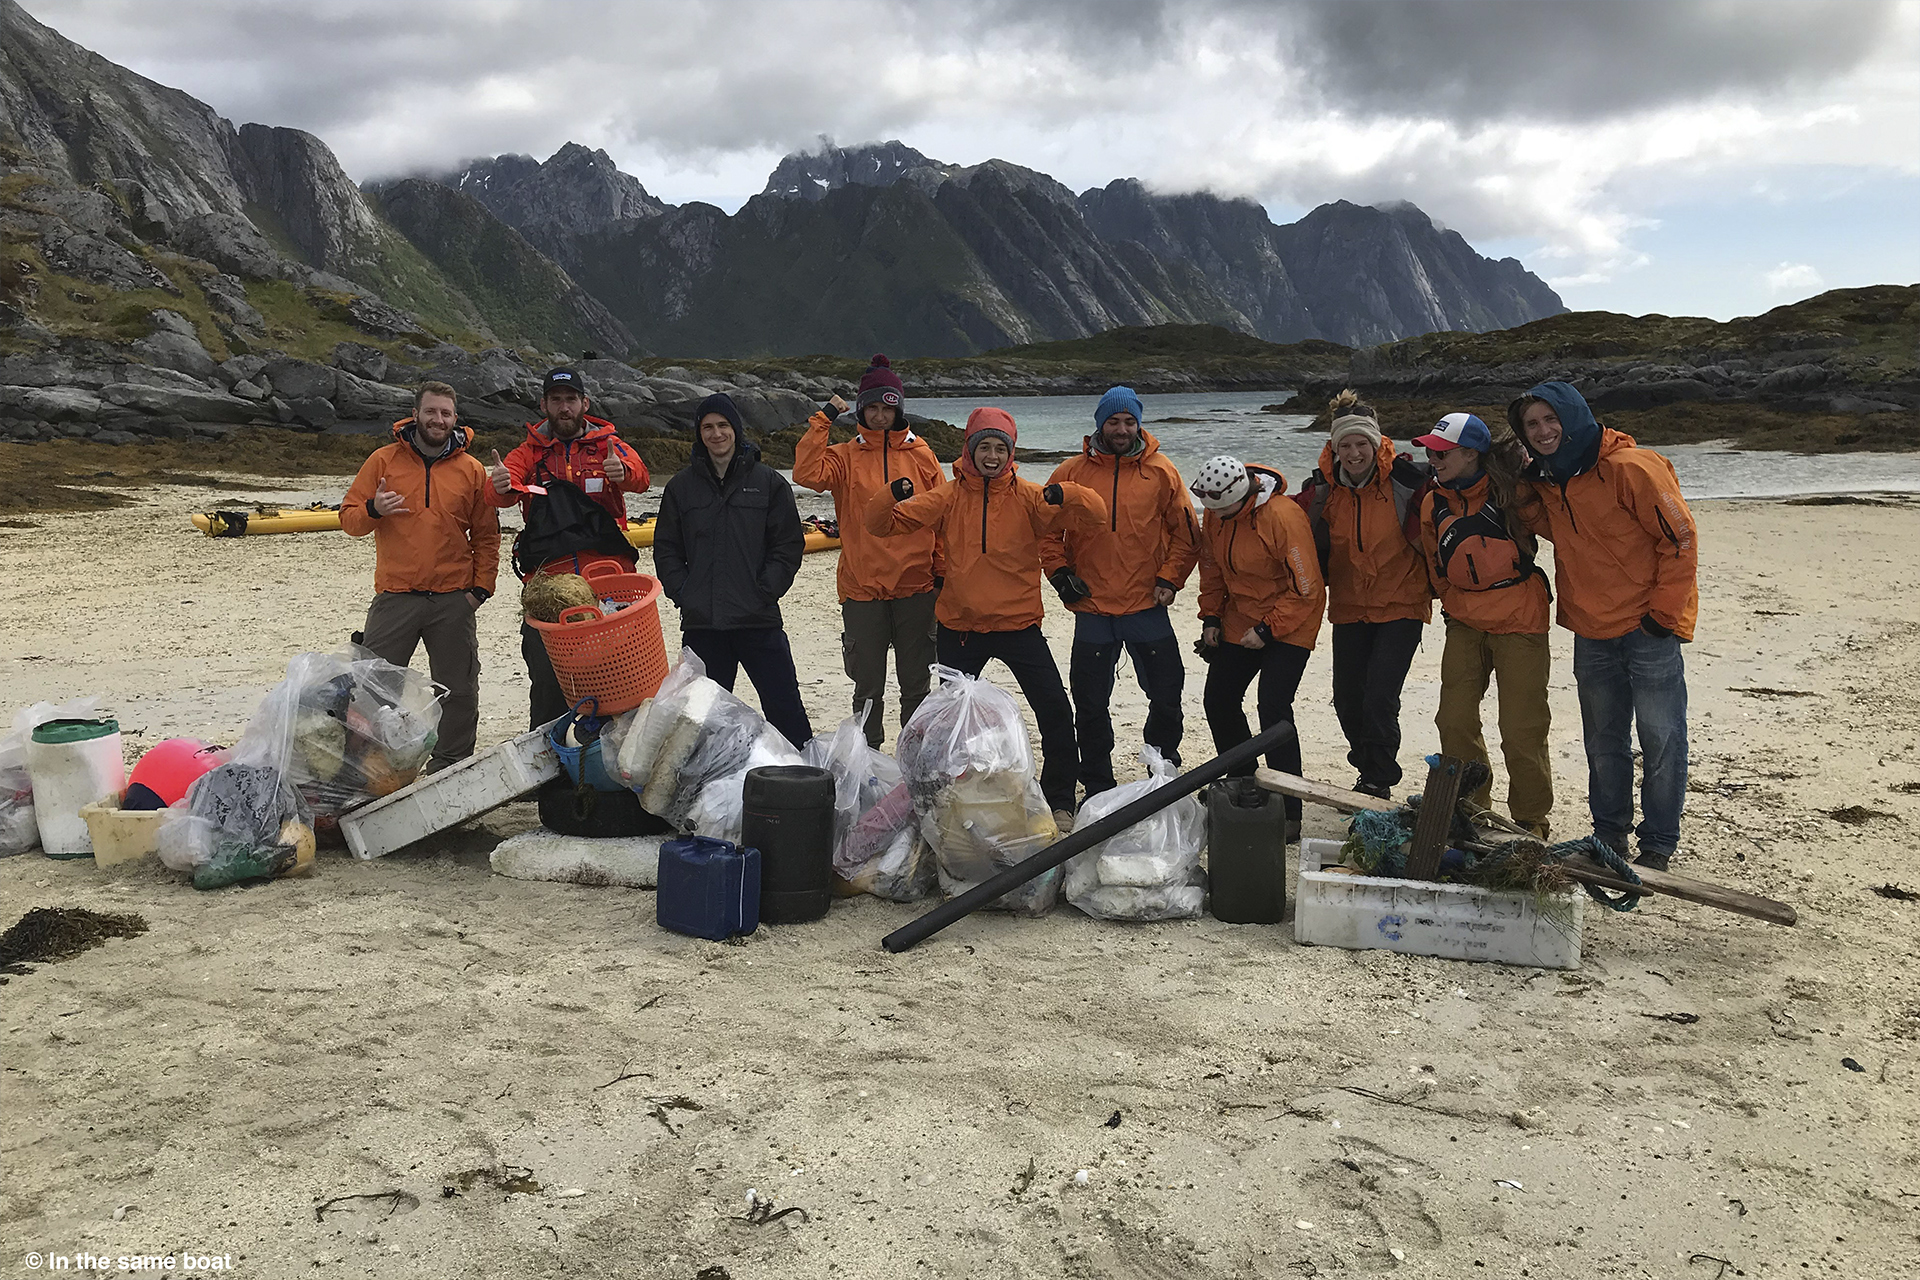 Glade ryddere på strand i Lofoten